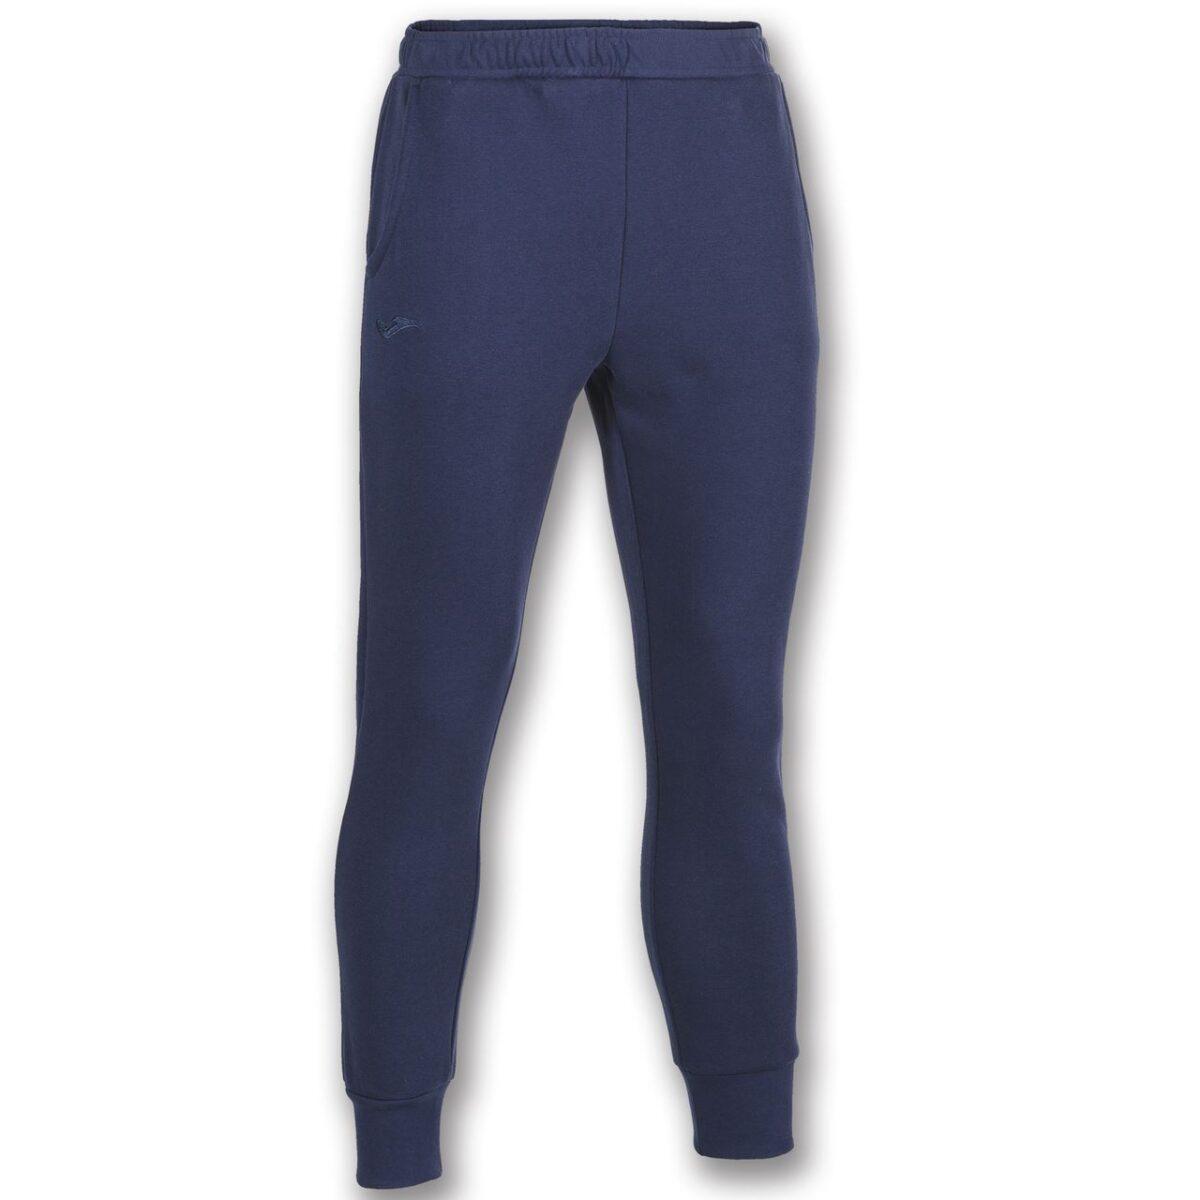 Joma Panteon II Cotton Long Pants 100889